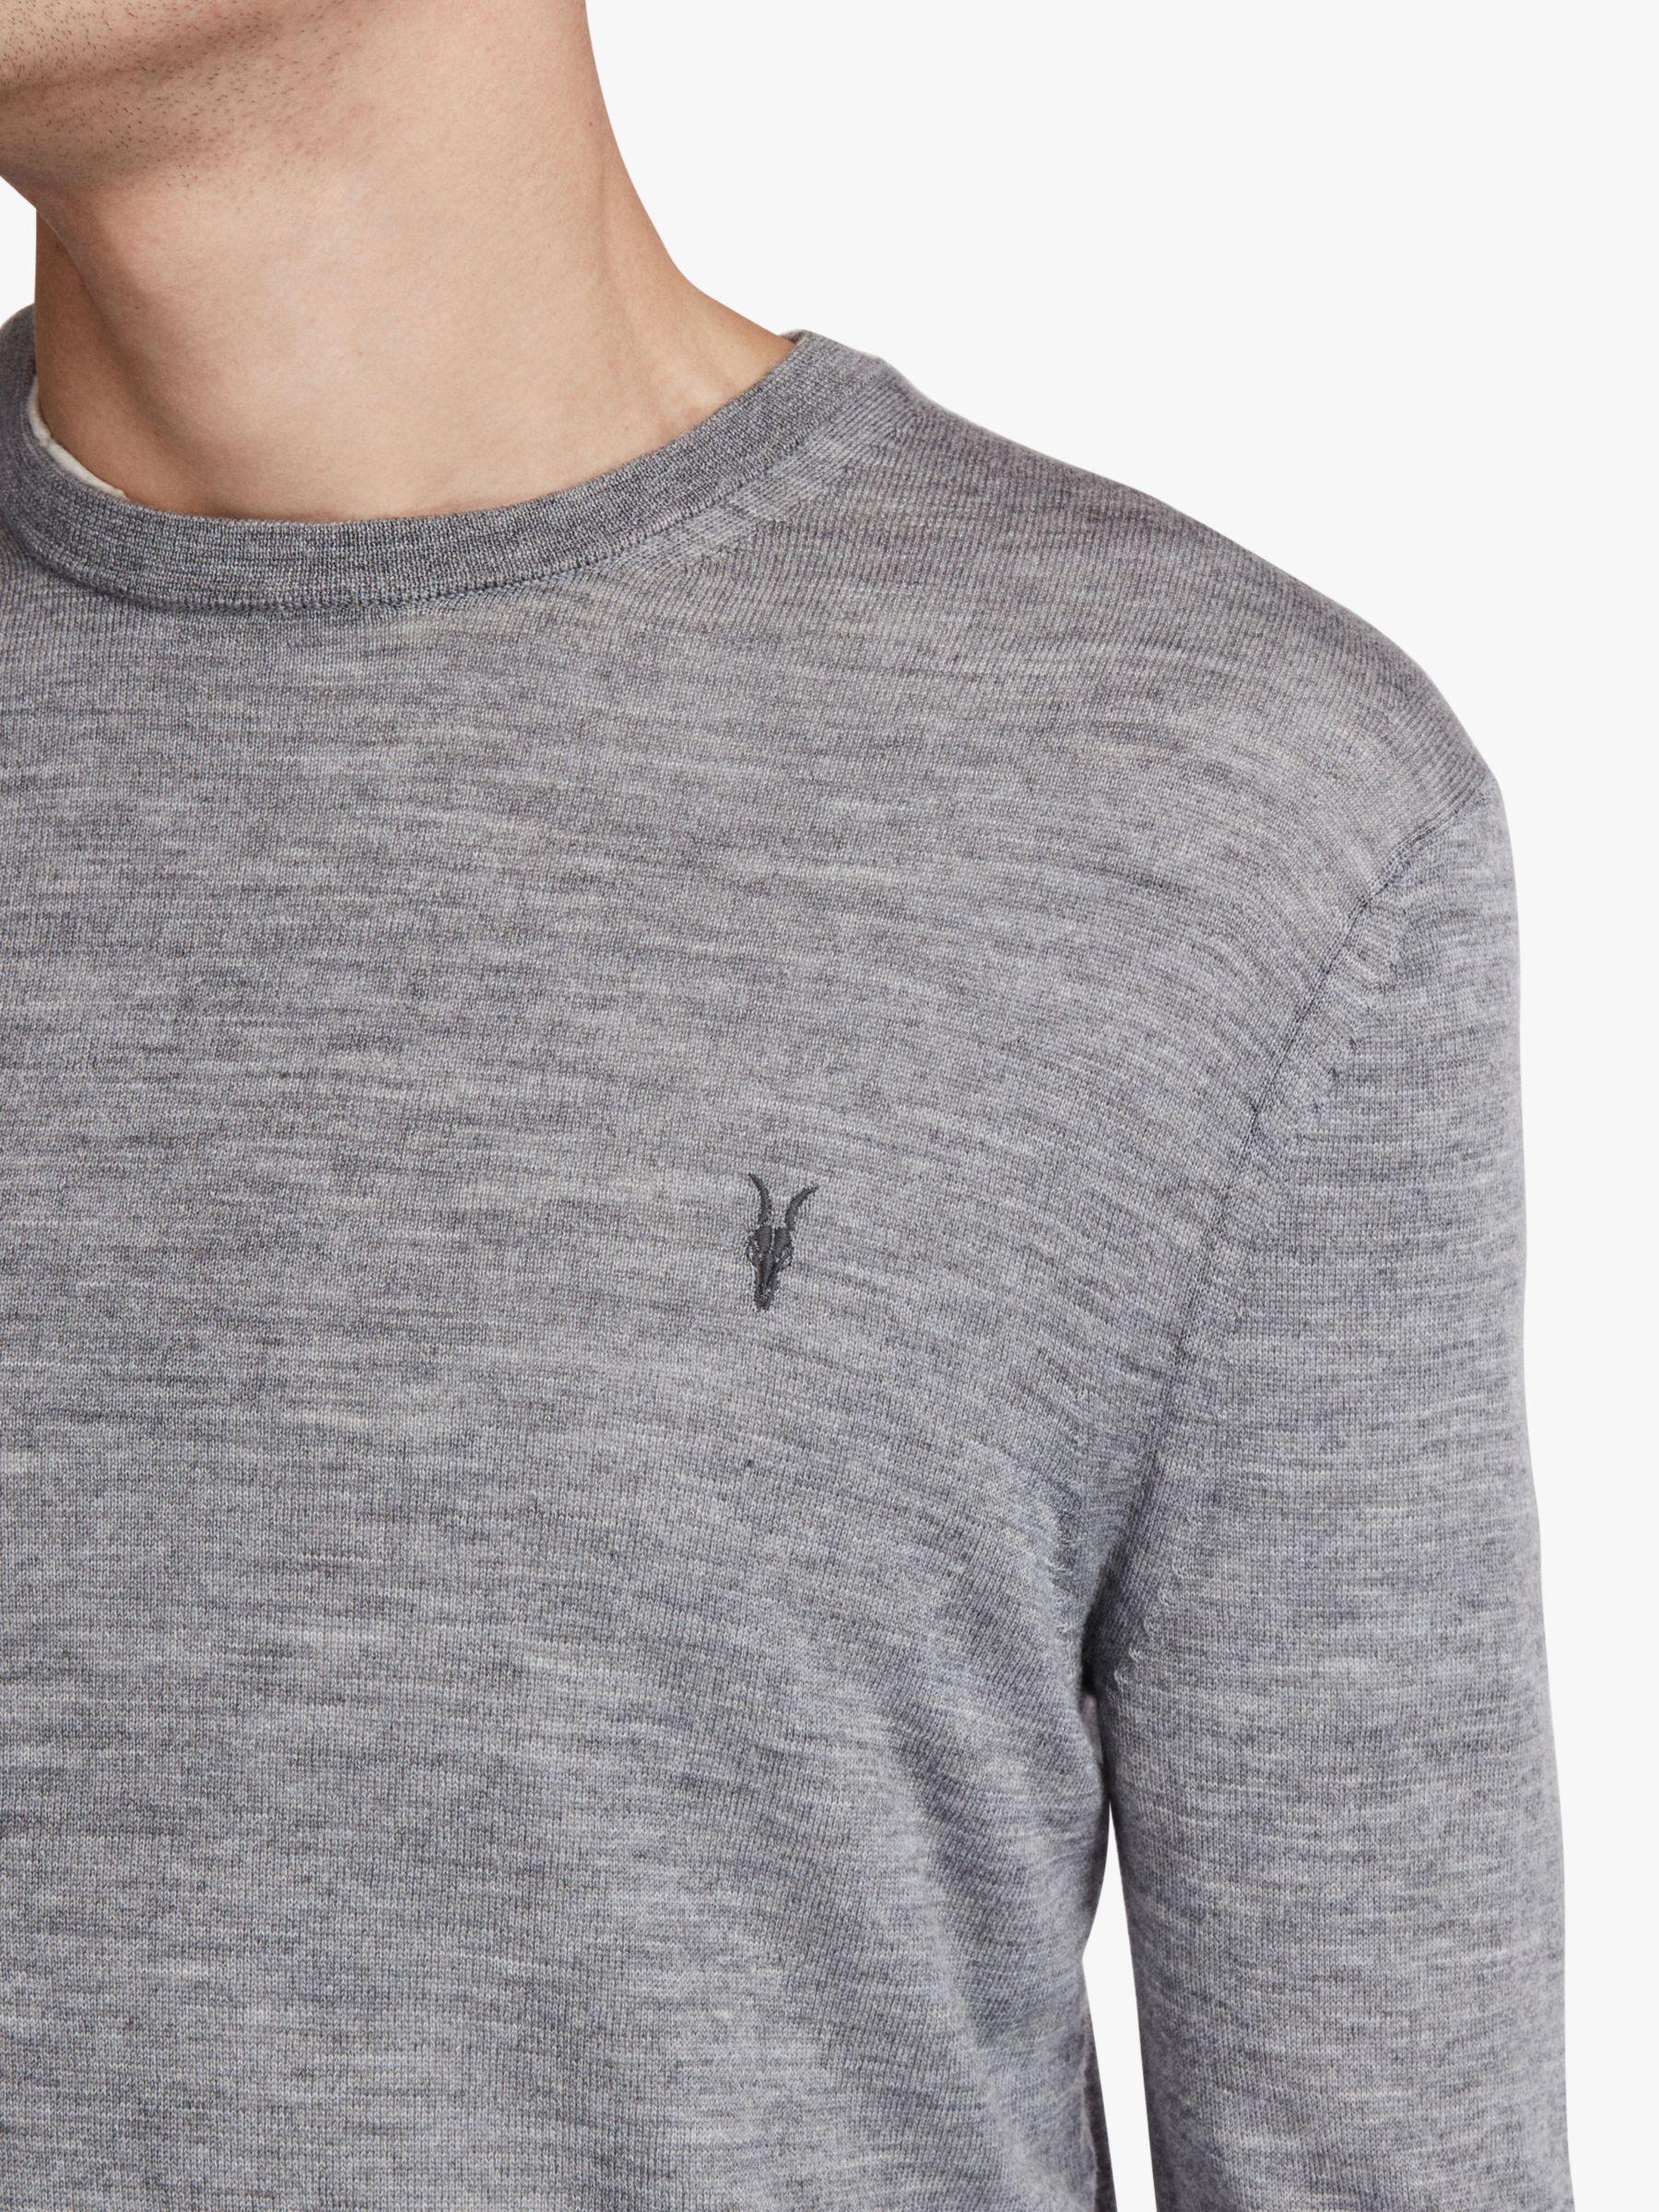 AllSaints Wool Mode Crew Jumper in Grey (Grey) for Men